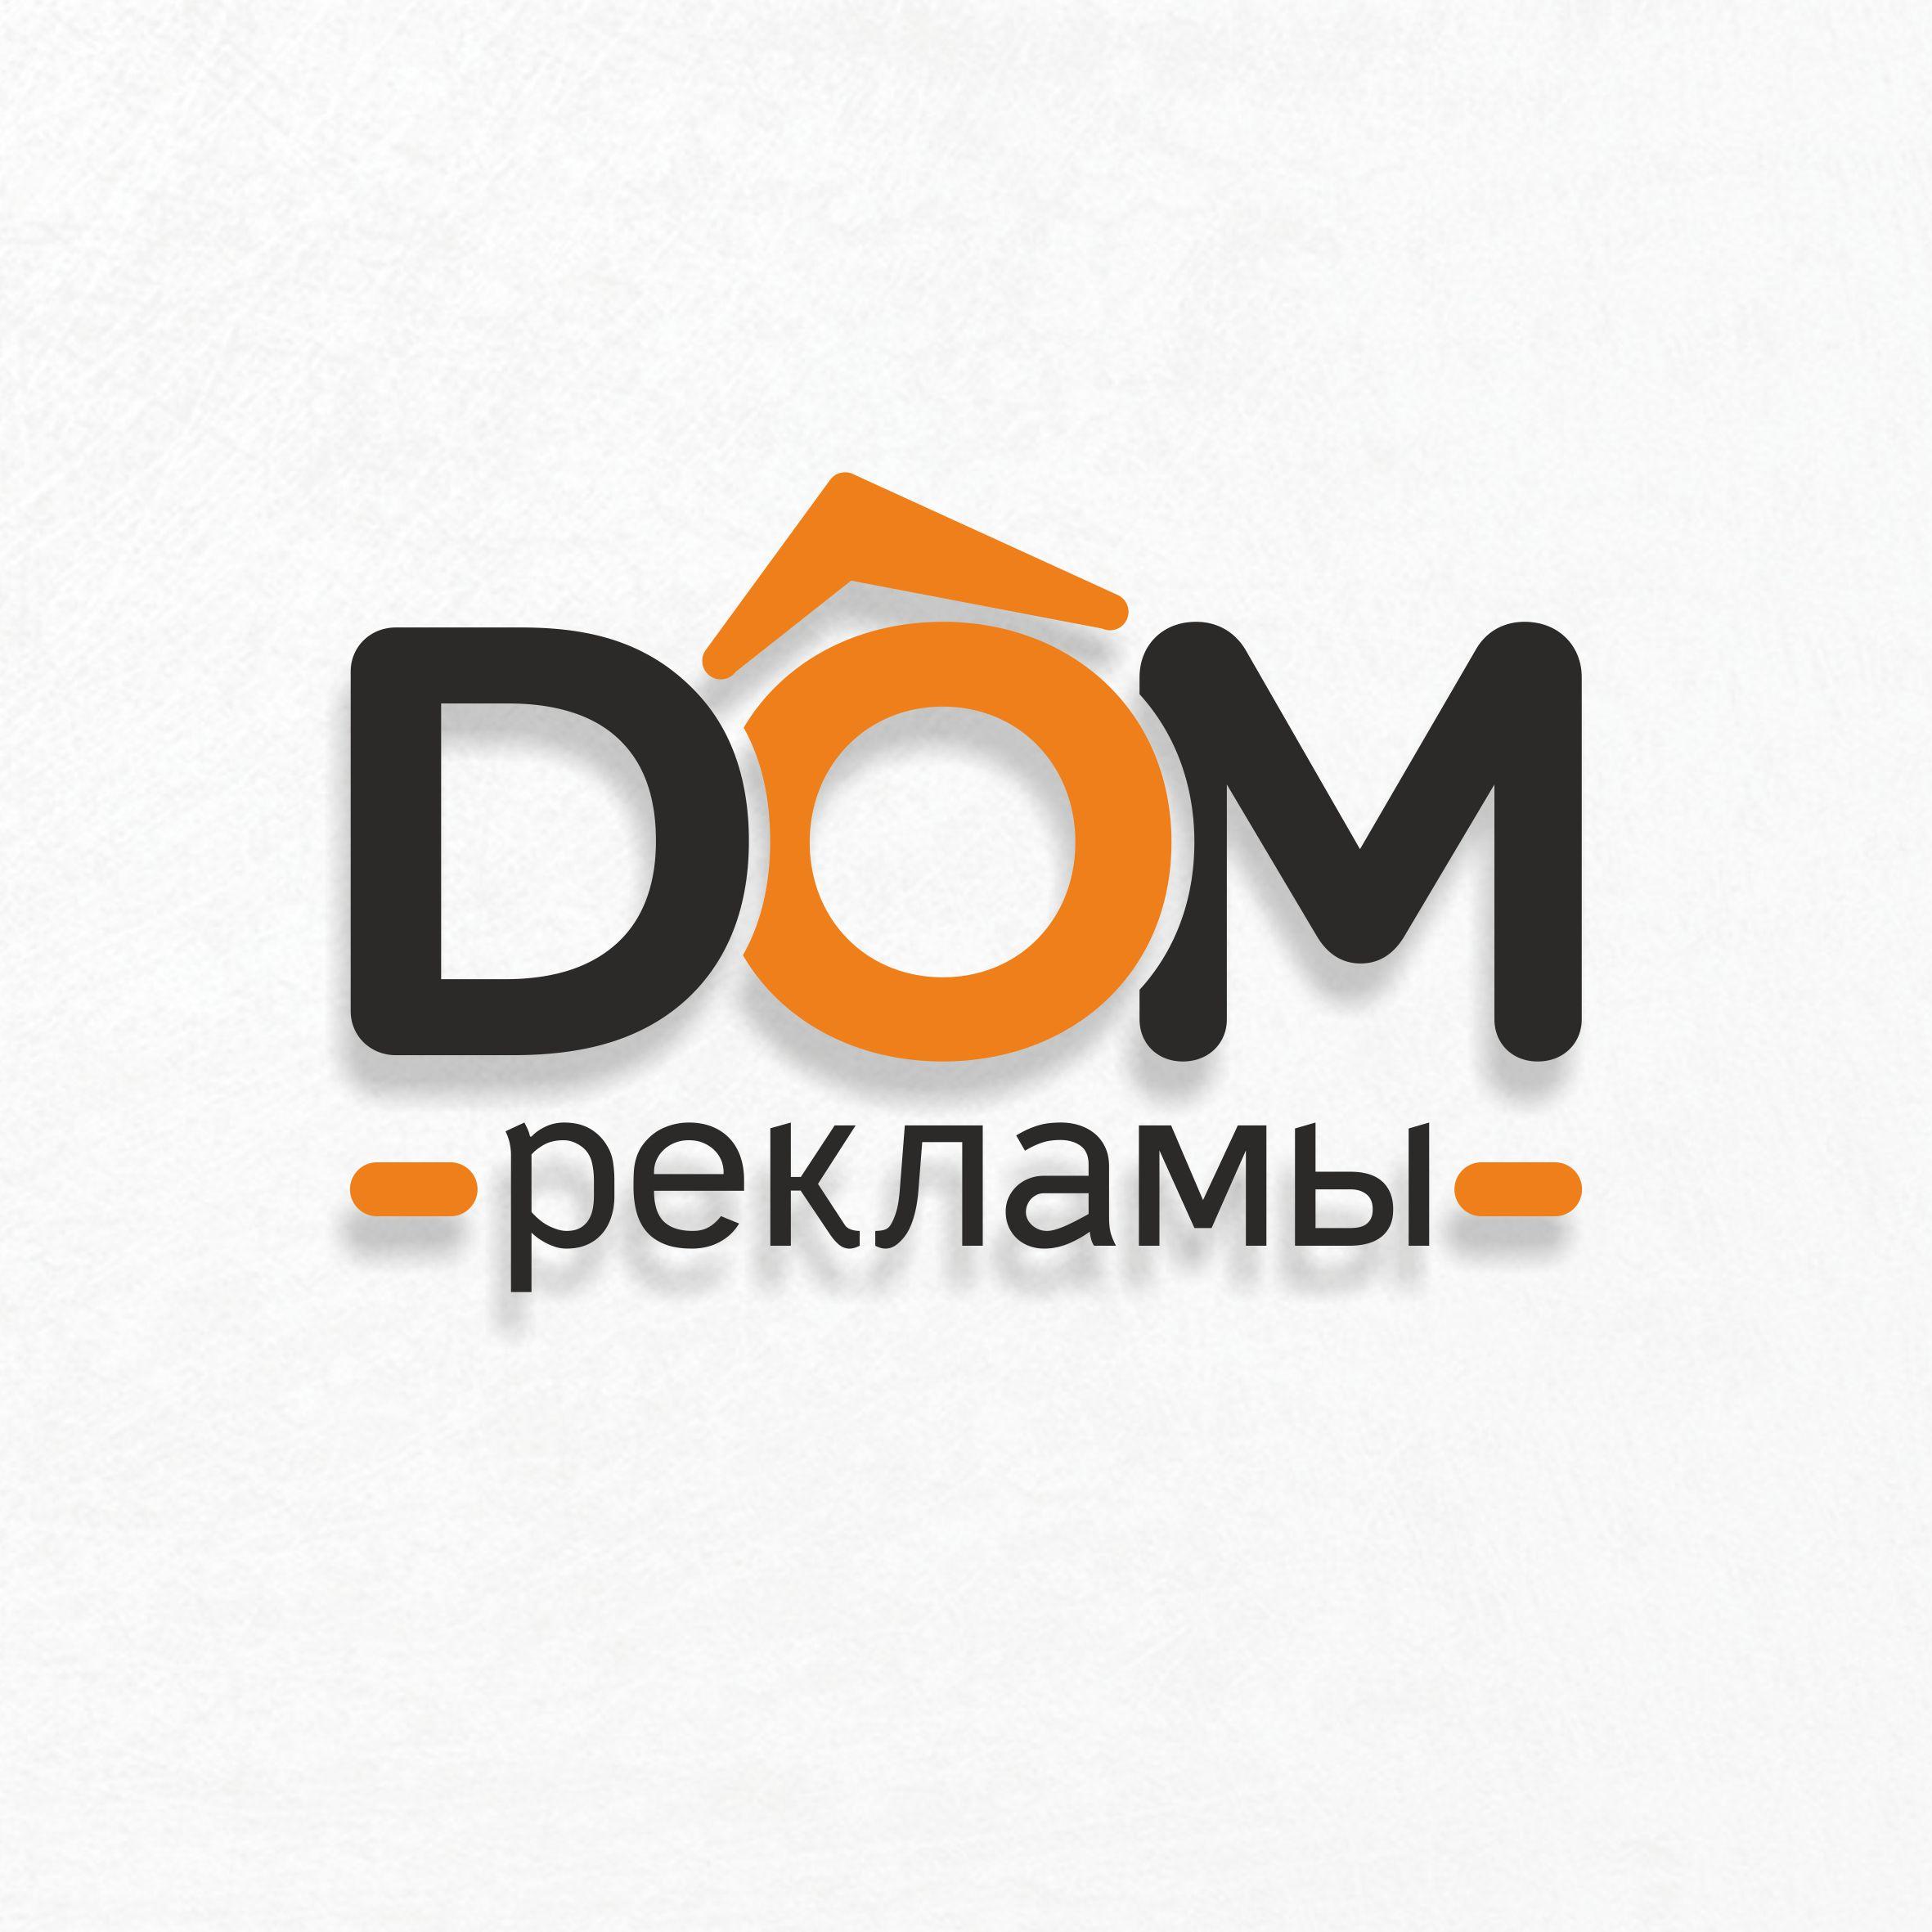 Дизайн логотипа рекламно-производственной компании фото f_2835edbc4b5c45fb.jpg